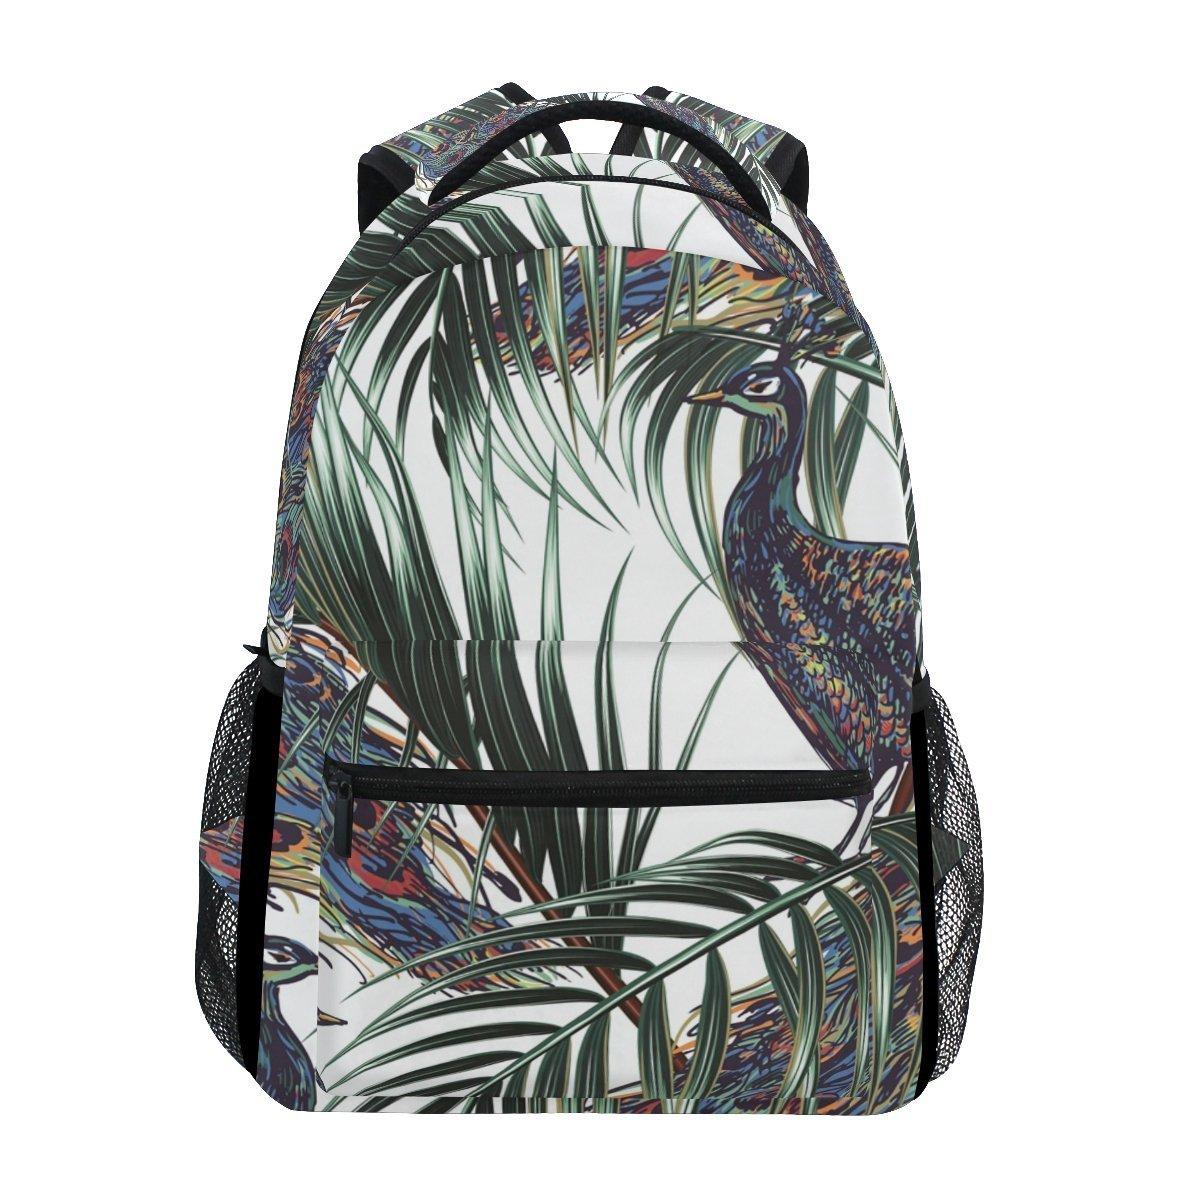 Laptop Backpack Lightweight Waterproof Travel Backpack Double Zipper Design with Peacock Under The Luminous Light School Bag Laptop Bookbag Daypack for Women Kids